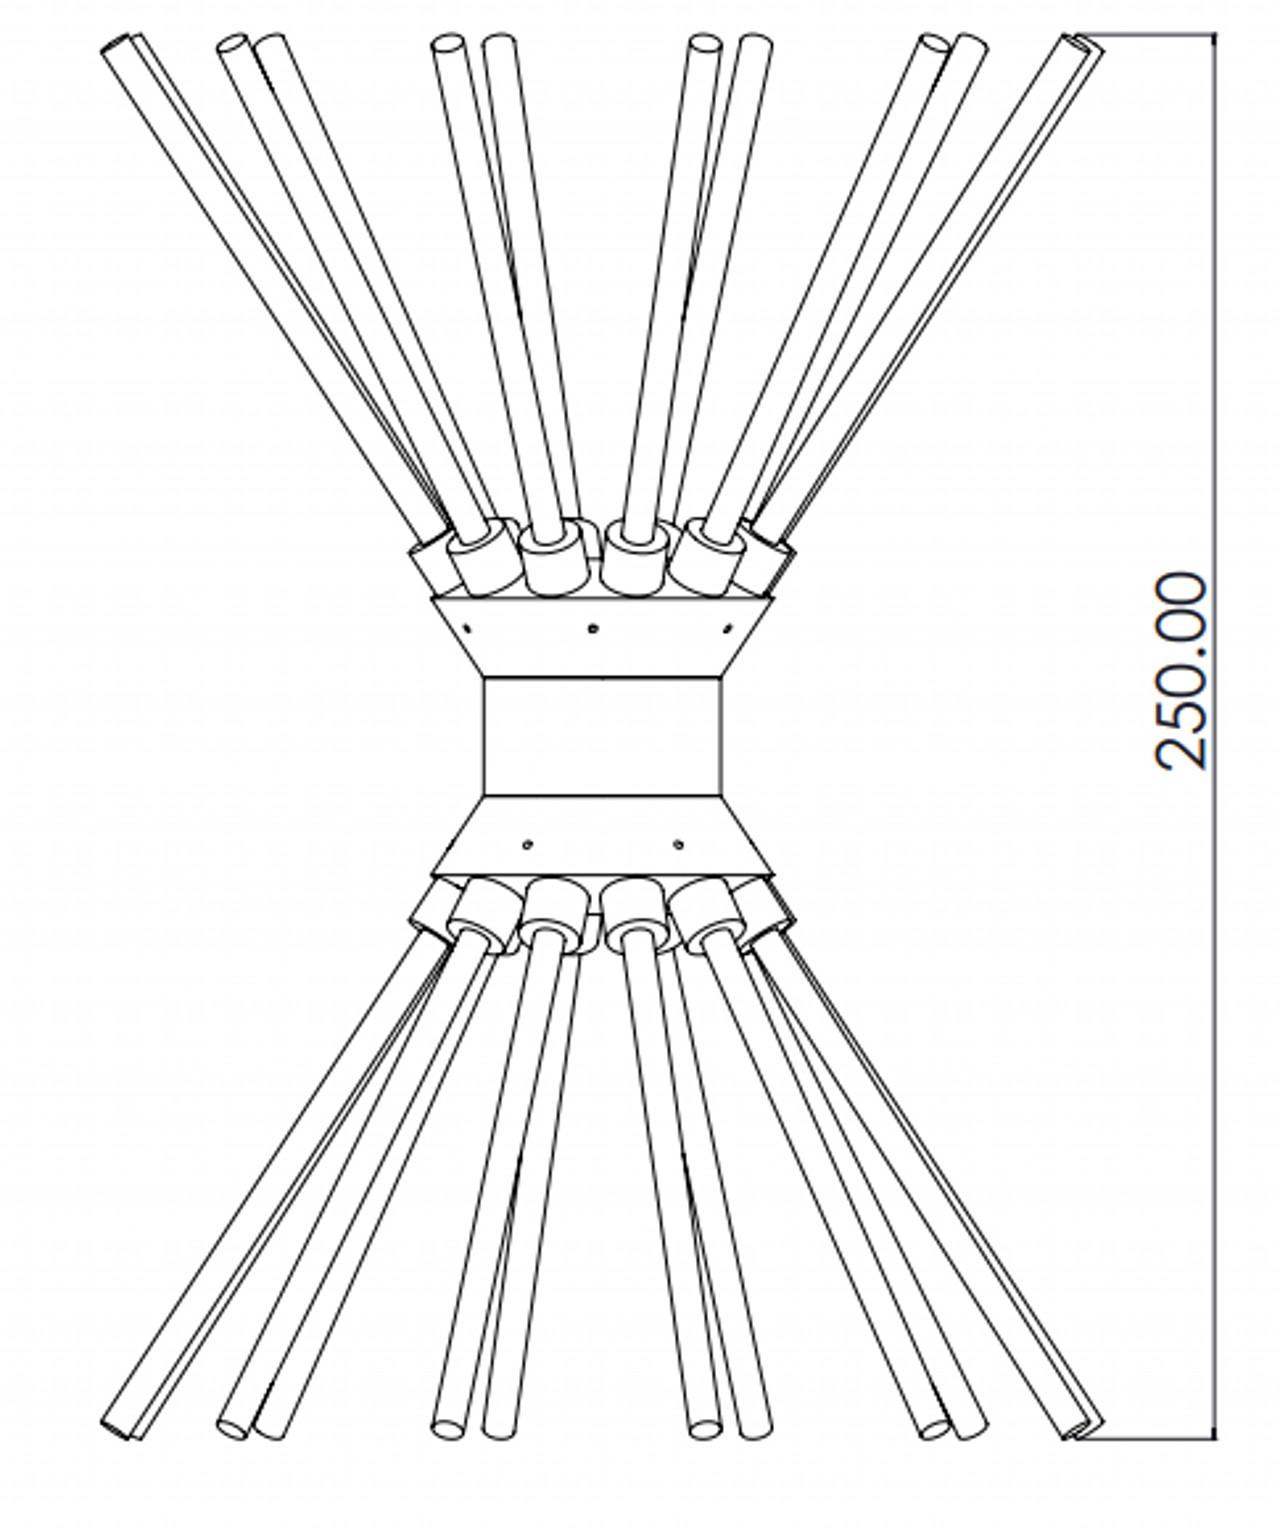 Biconical Antenna 30 MHz to 300 MHz for EMI/EMC Testing 200W